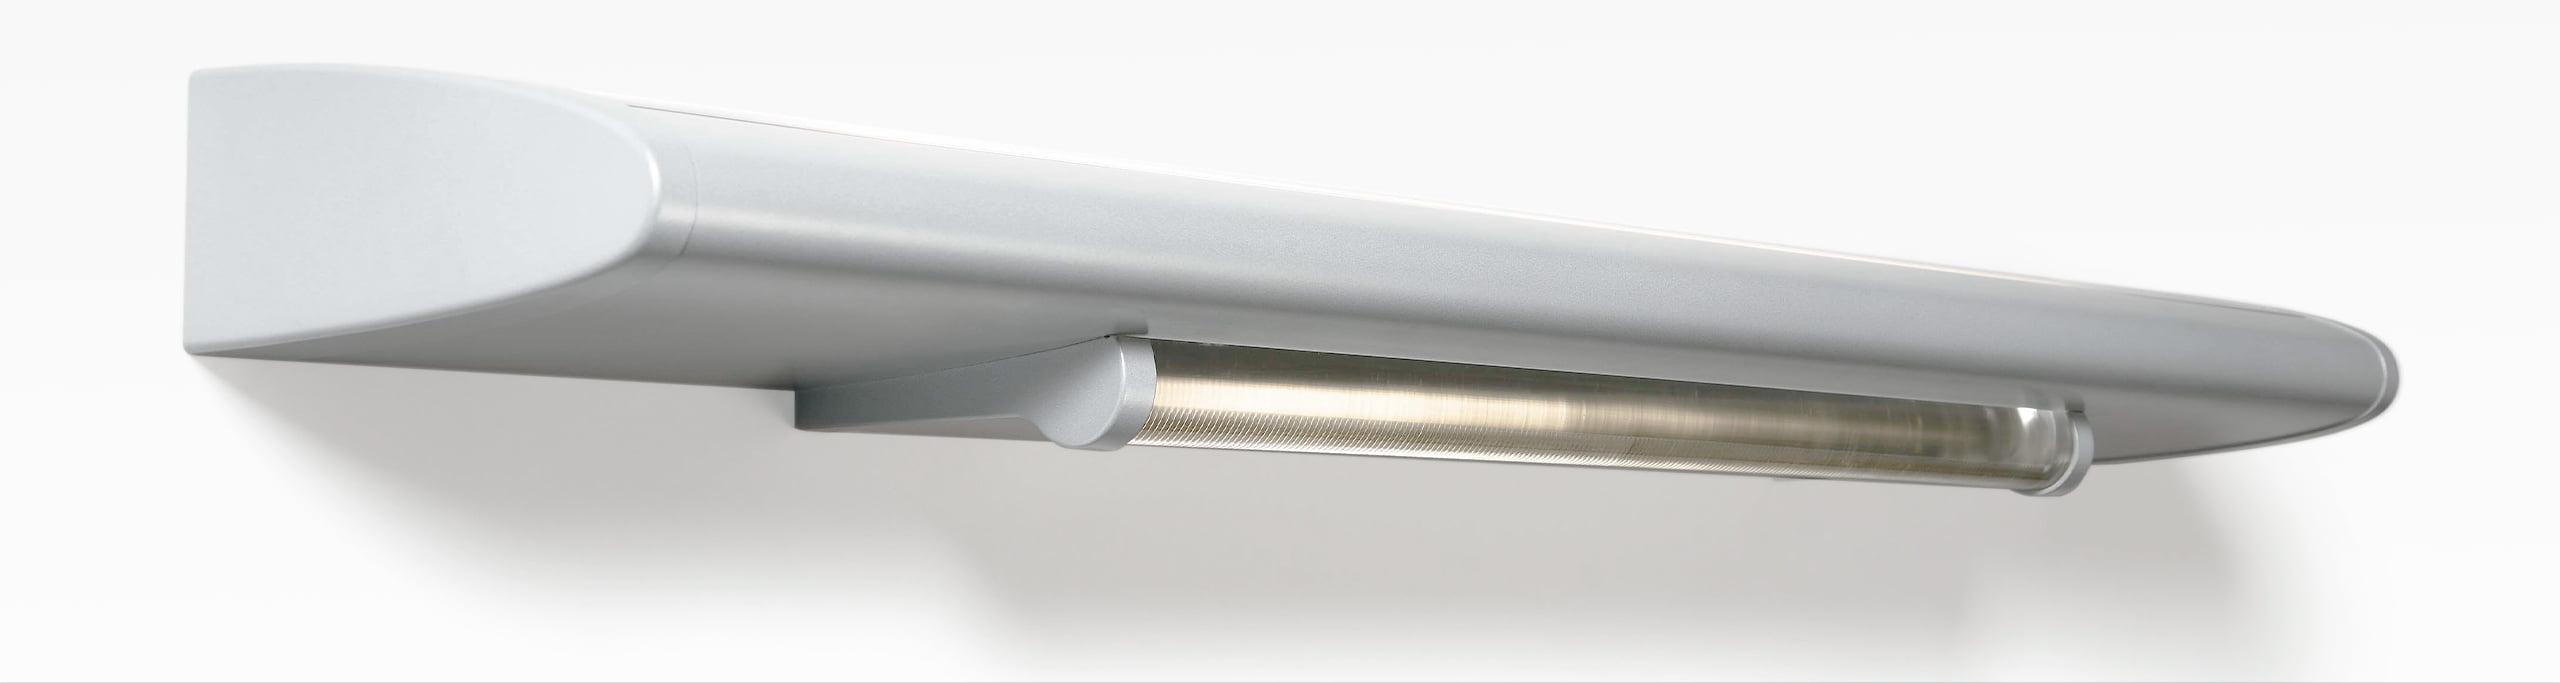 Joanna Boothman npk design Zumtobel Belia luminaire-2